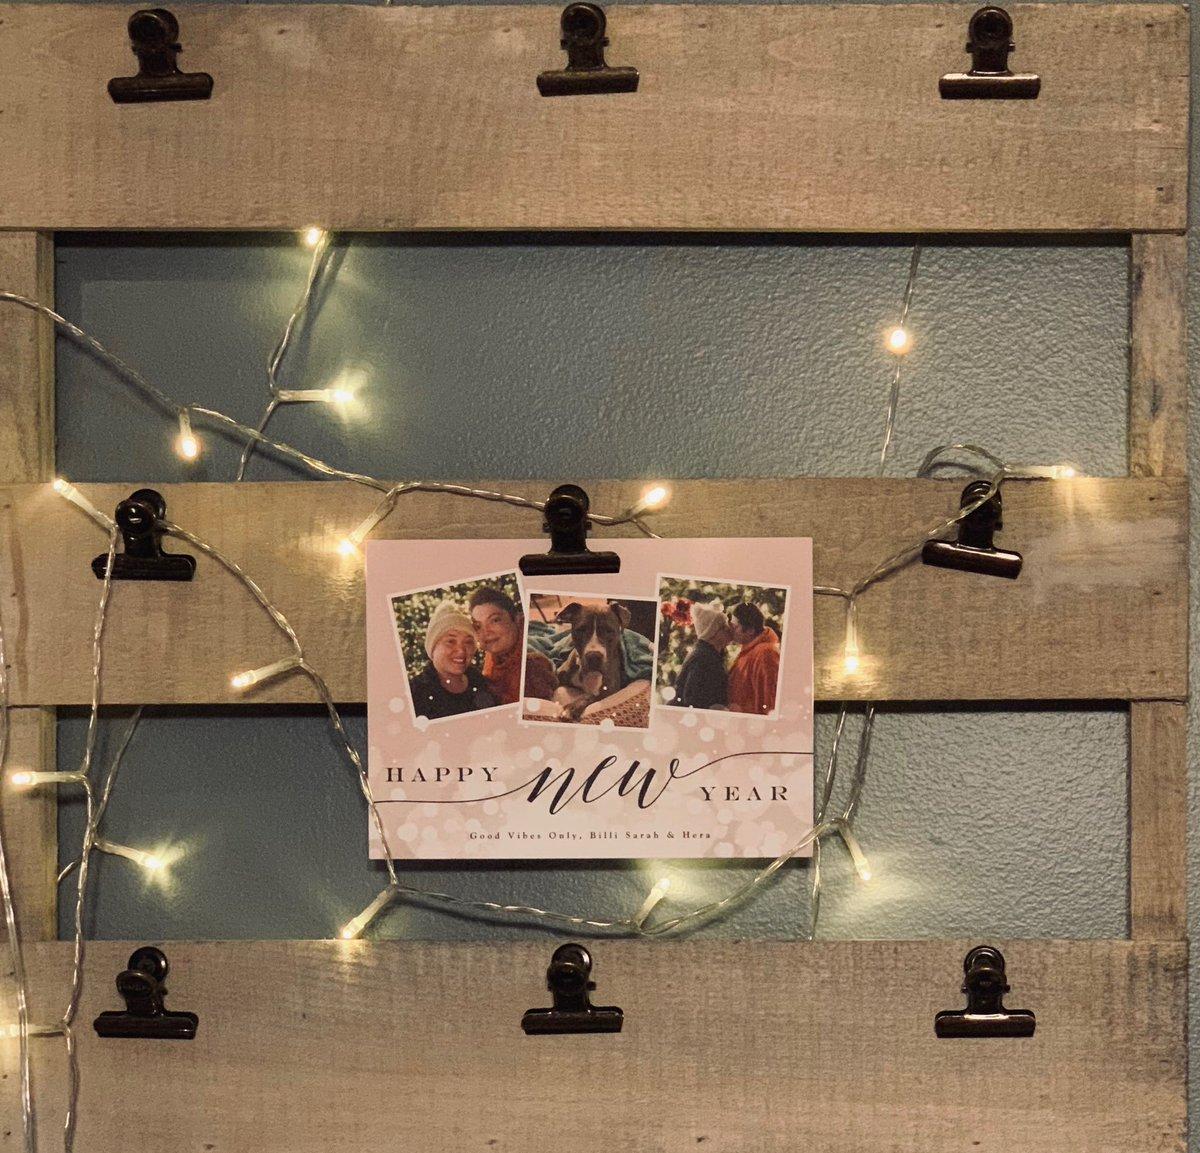 Go check out our intro ! https://youtu.be/M0N3_GQtZ58 #teamlesbian #lgbtcommunity #lgbtsupporter #lovewins #youtubeviideos #youtuber #subscribe #subscribetomychannel #subscriber #1ksubscribers #upcomingyoutuber #pitbull #pitbulllove #pitbullsofinstagram #pitbullmom #newintor #newyearpic.twitter.com/cWxEyKRpoL